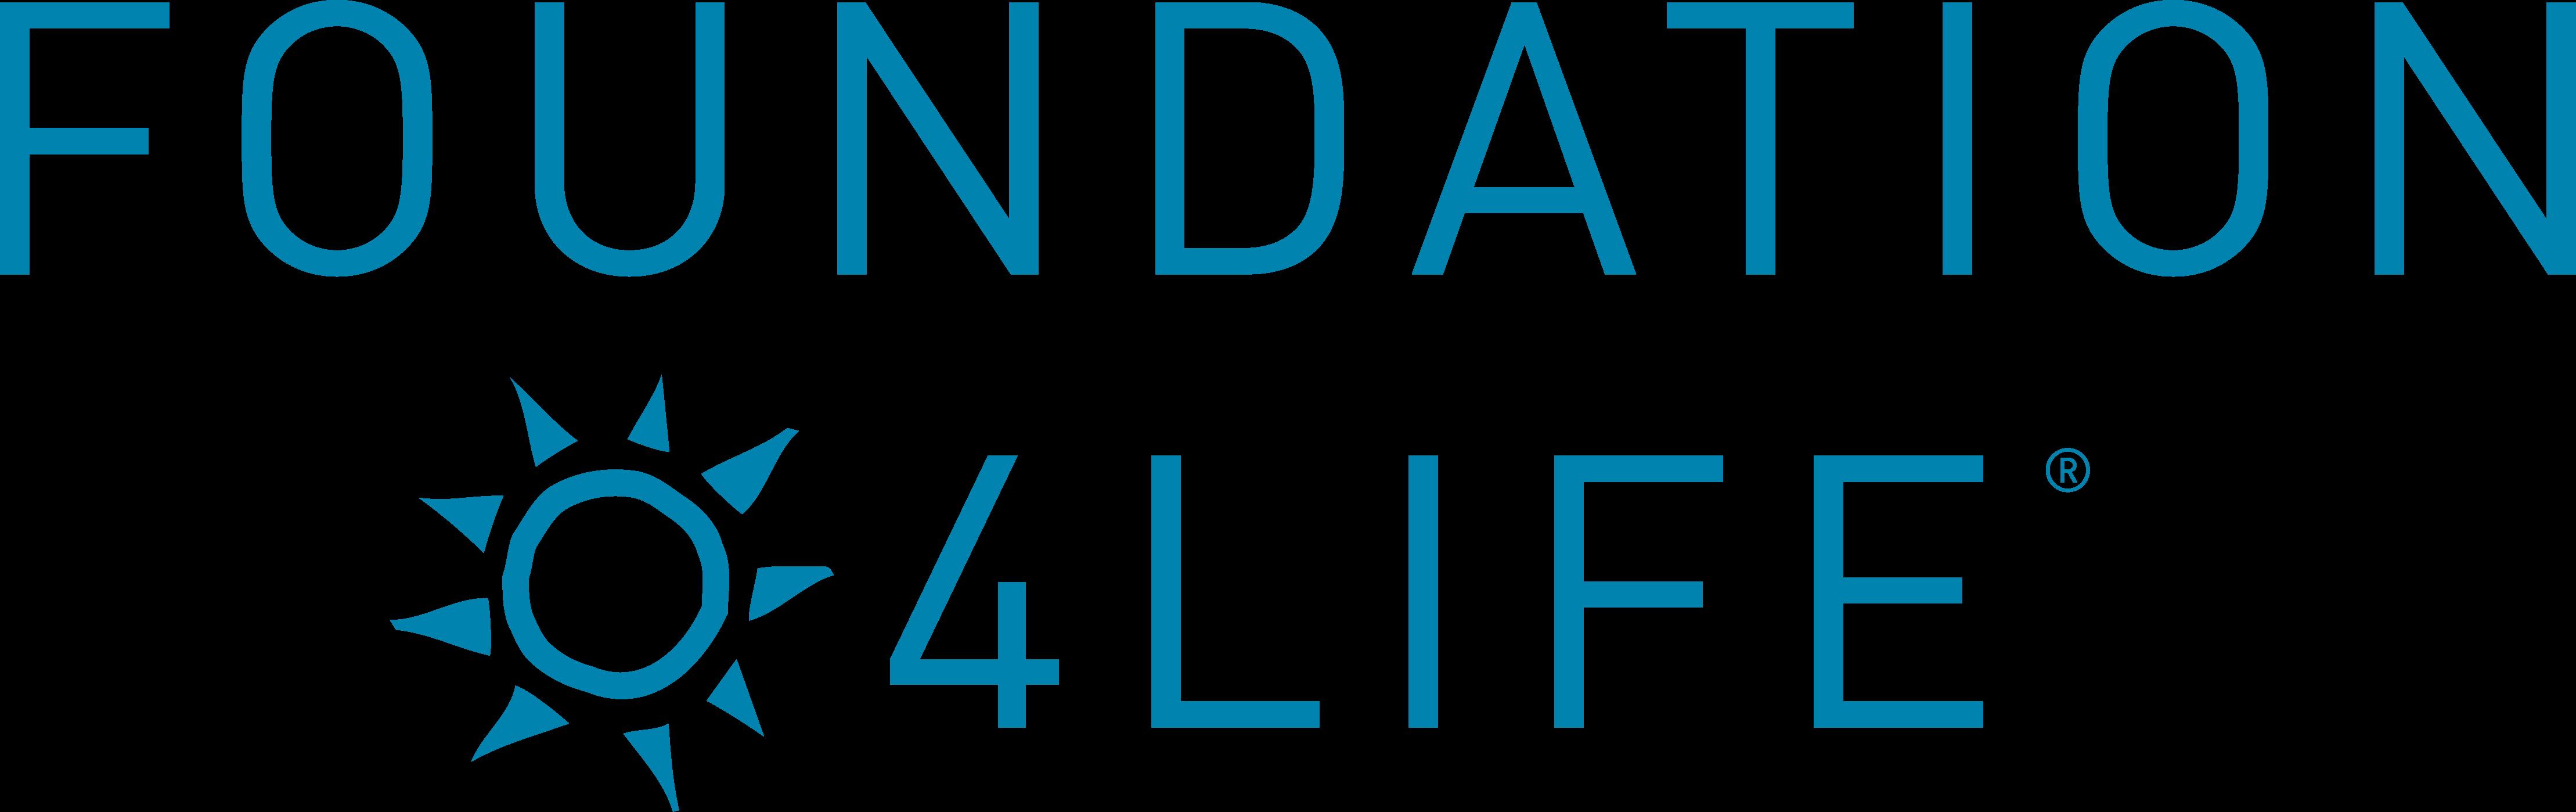 Foundation 4Life